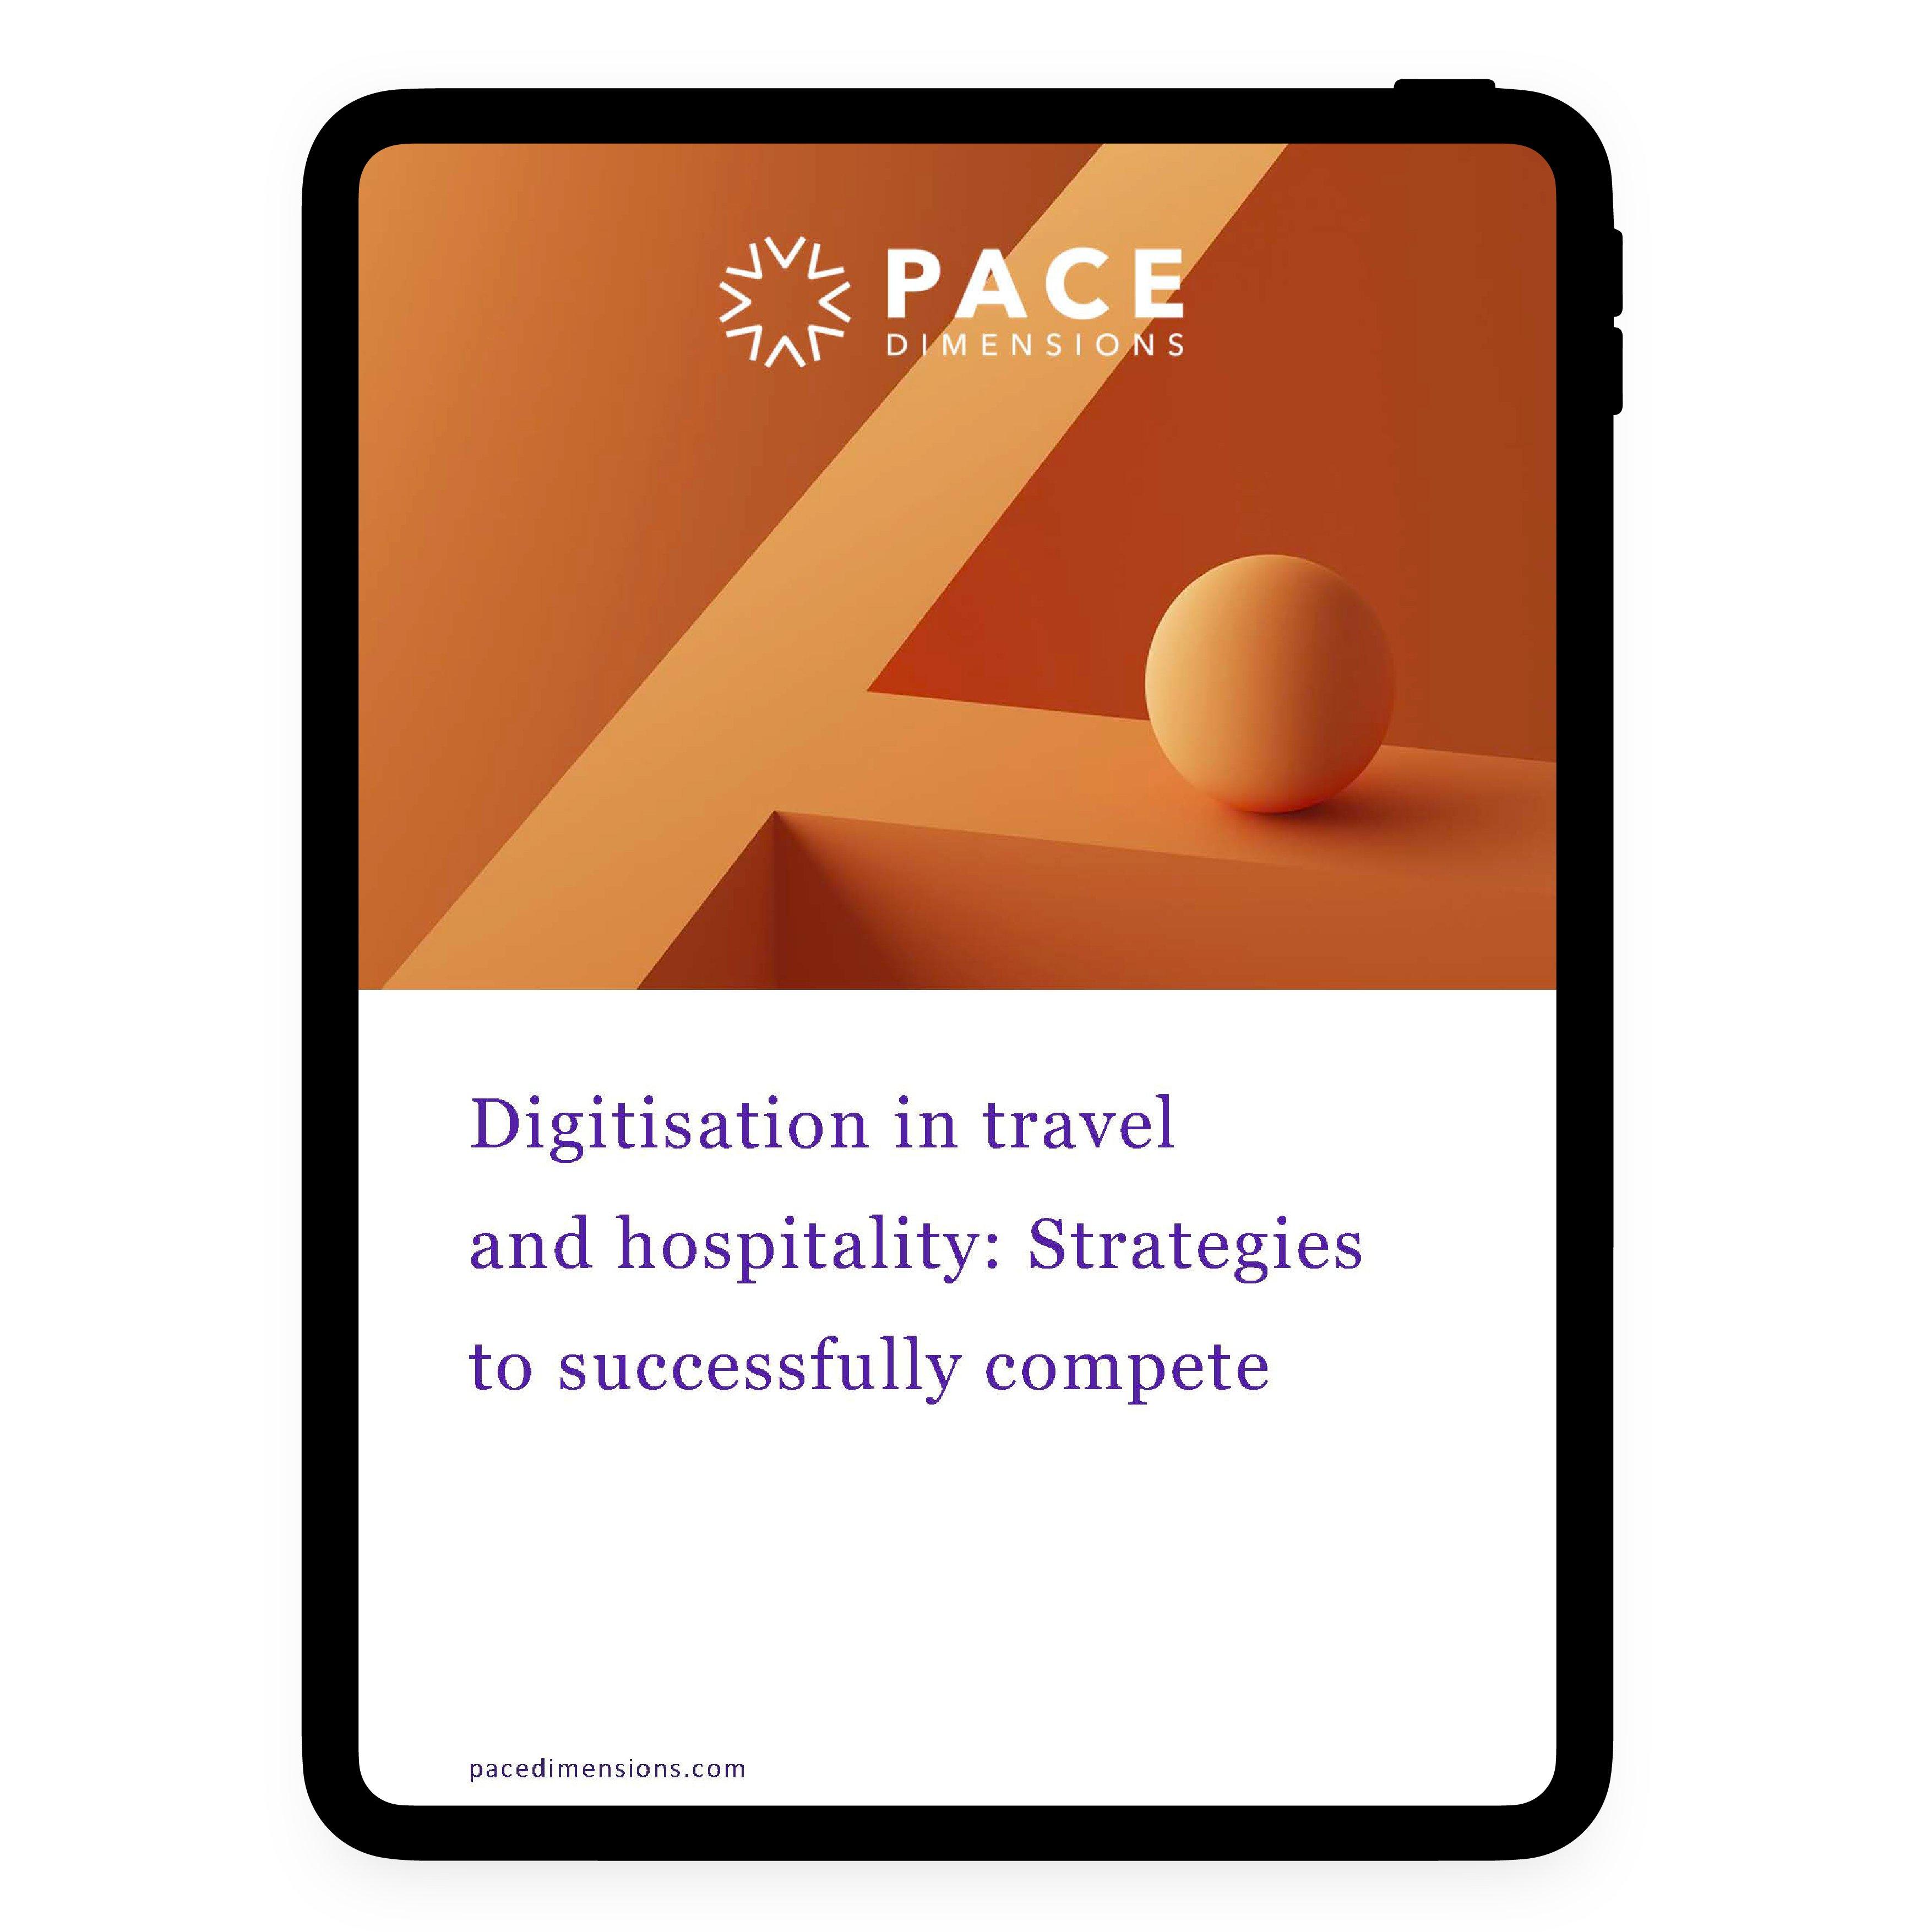 digitisation-travel-hospitality-strategies-to-compete-whitepaper